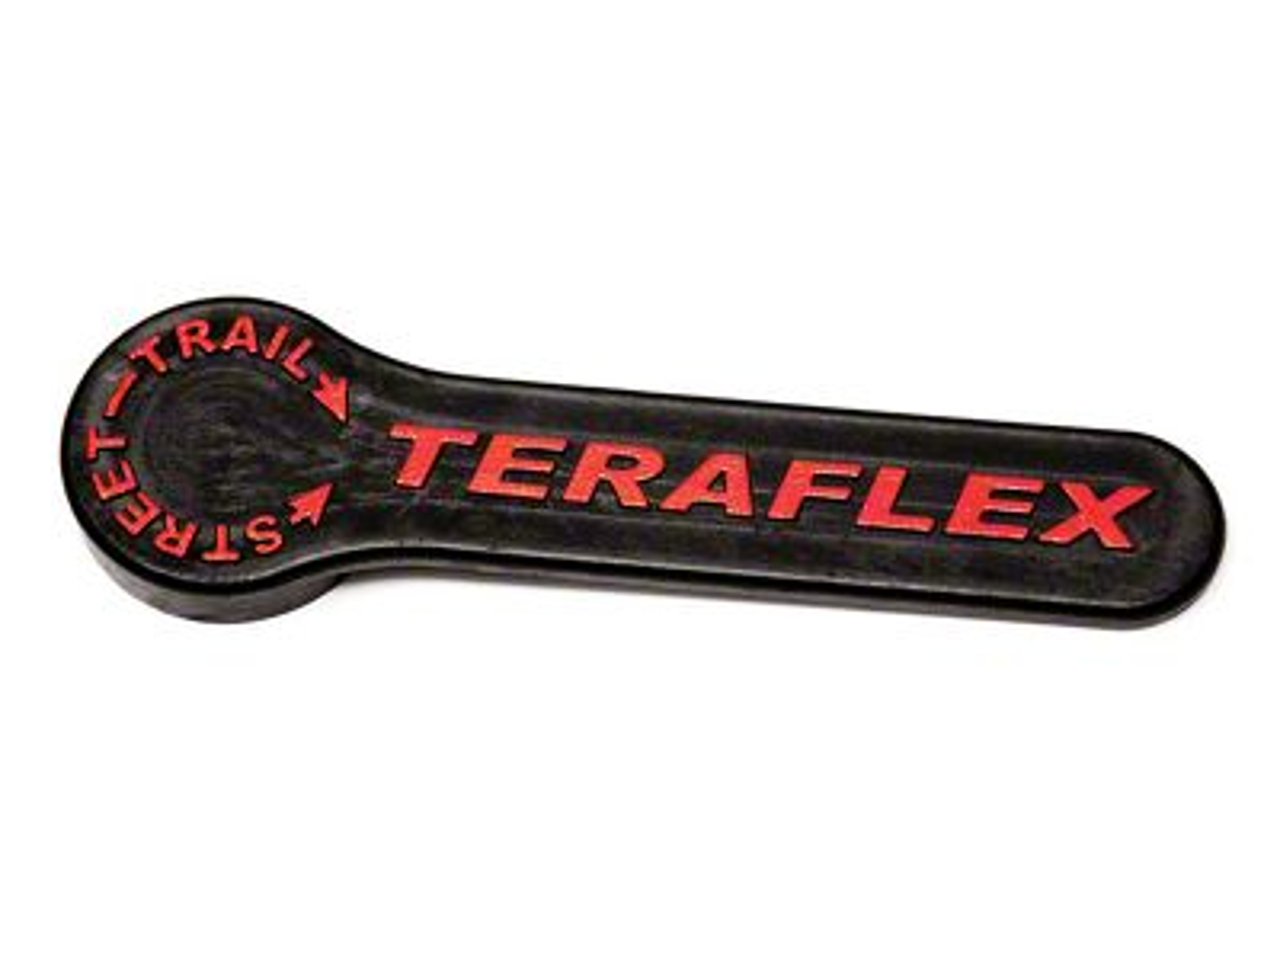 Teraflex S/T Sway Bar Knob Wrench (97-18 Jeep Wrangler TJ & JK)